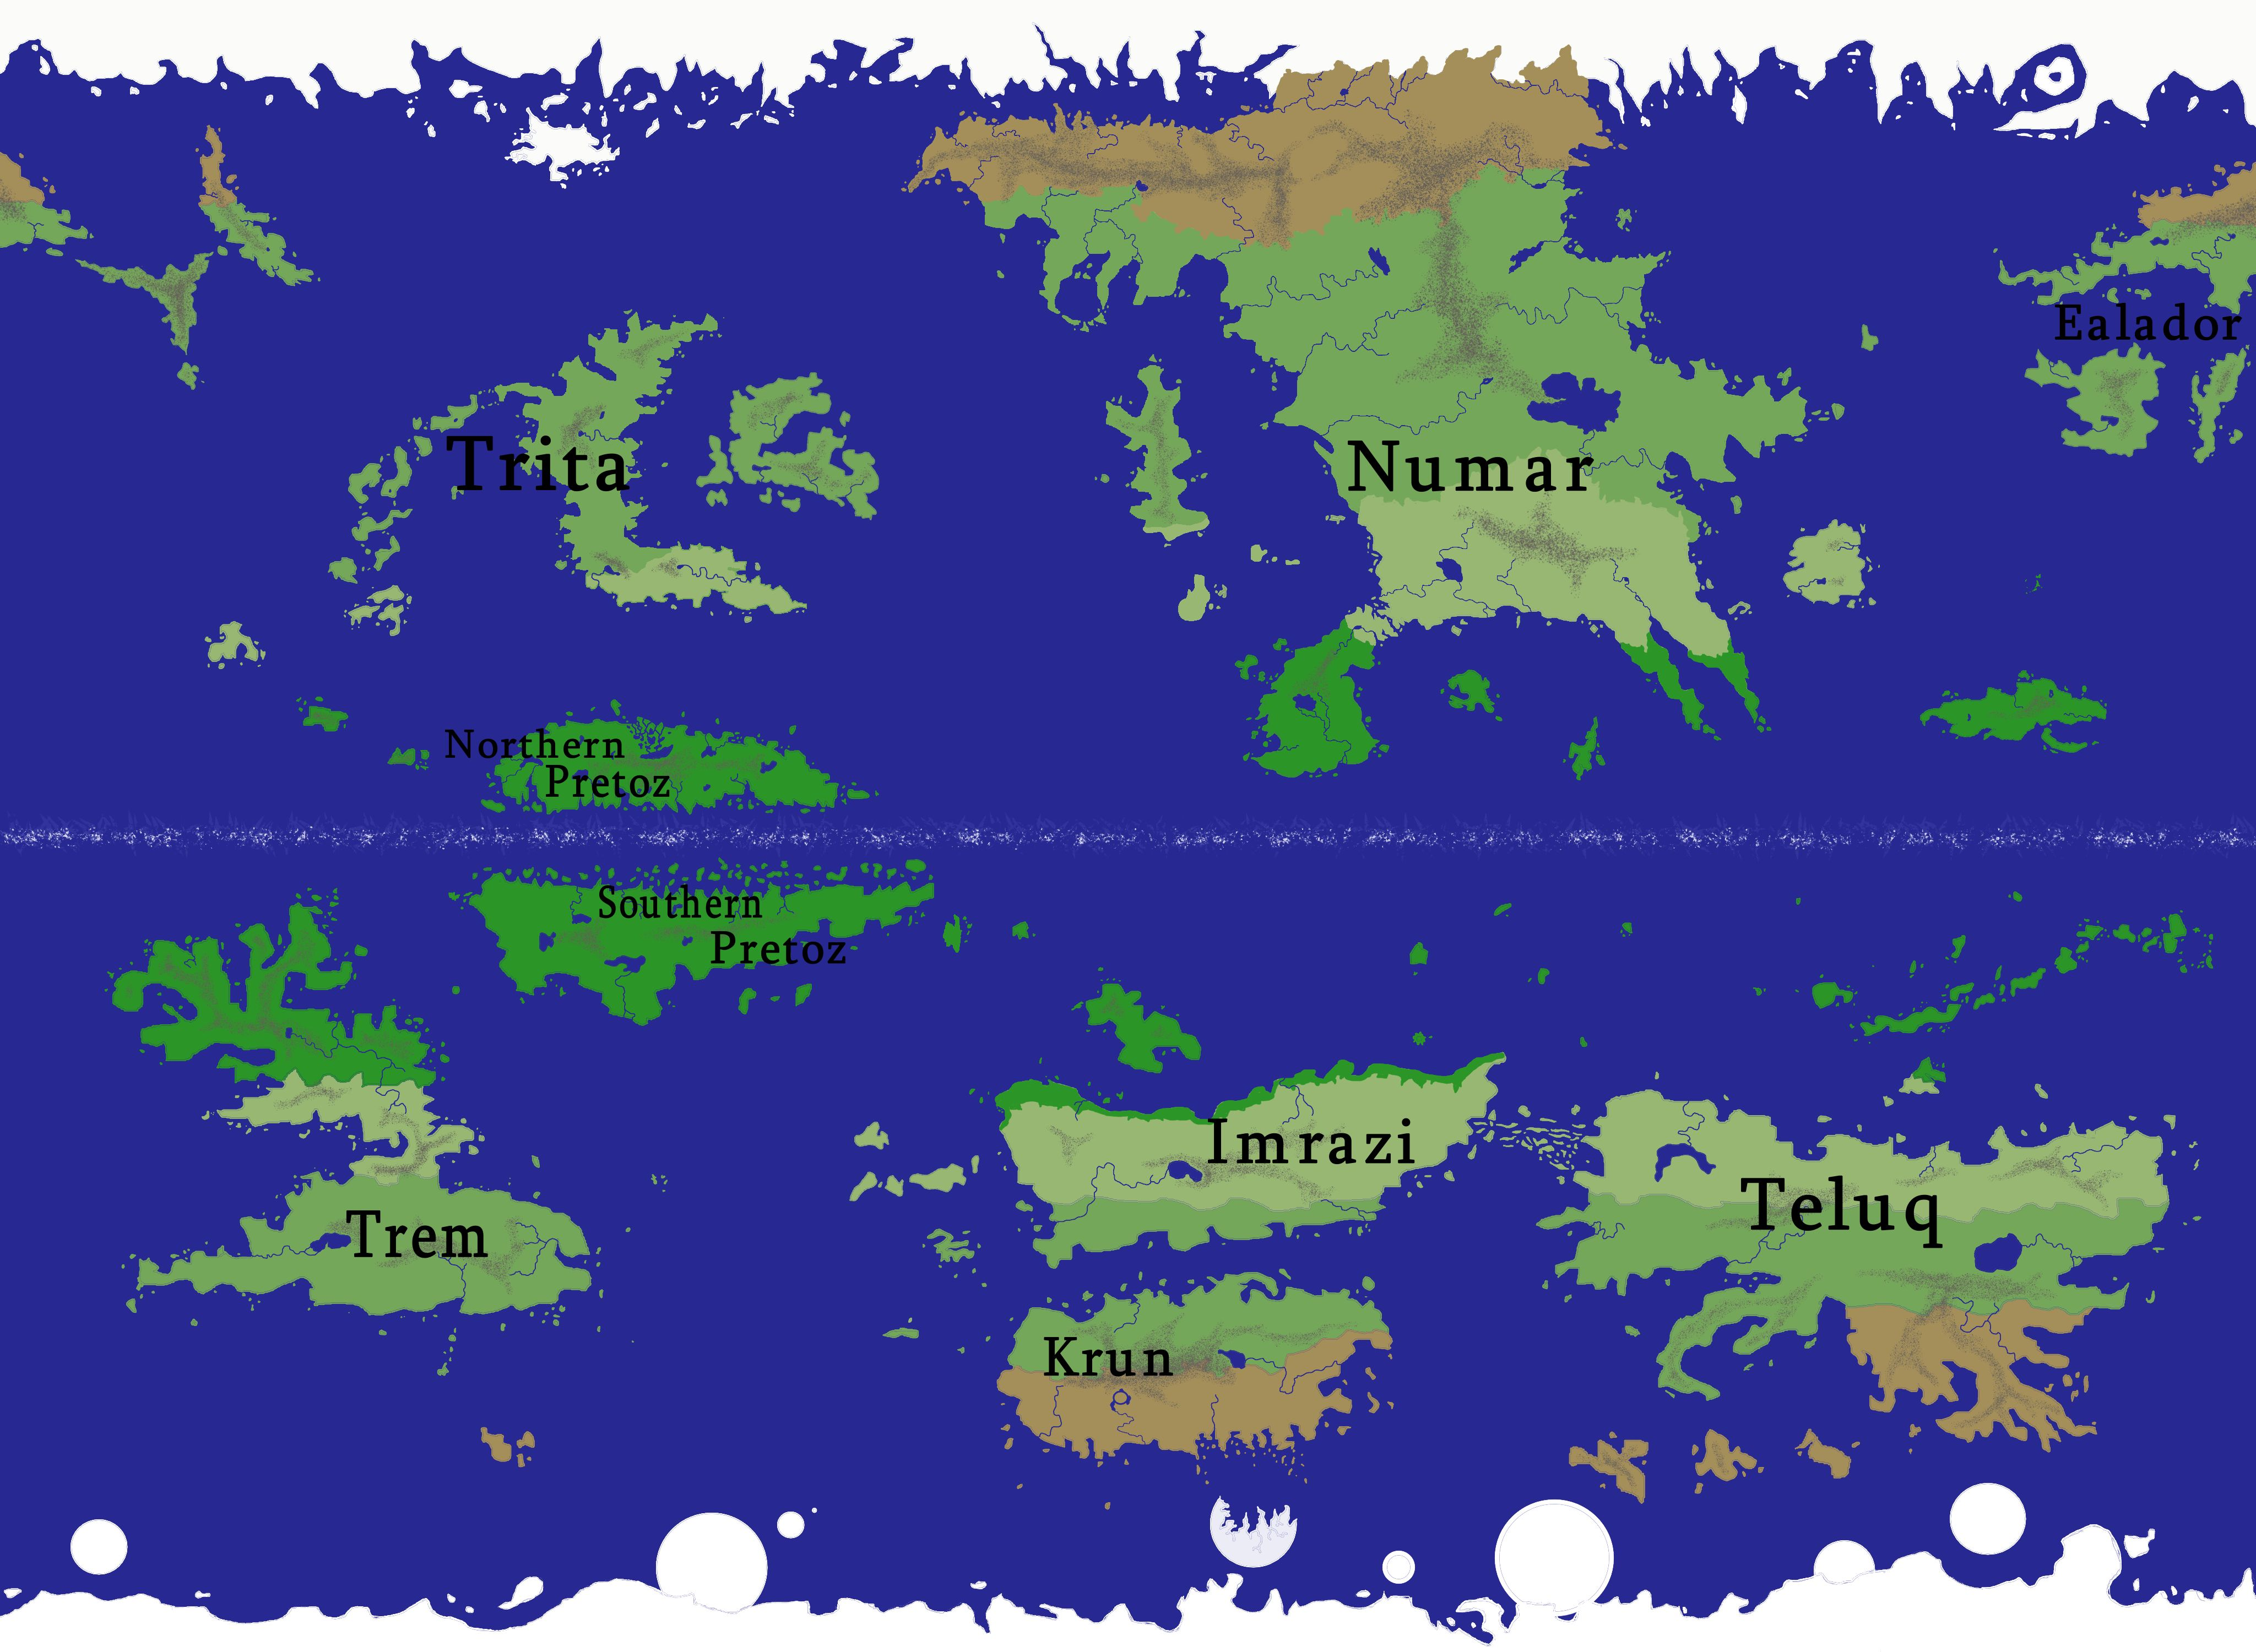 Amaru_Atlas2.jpg